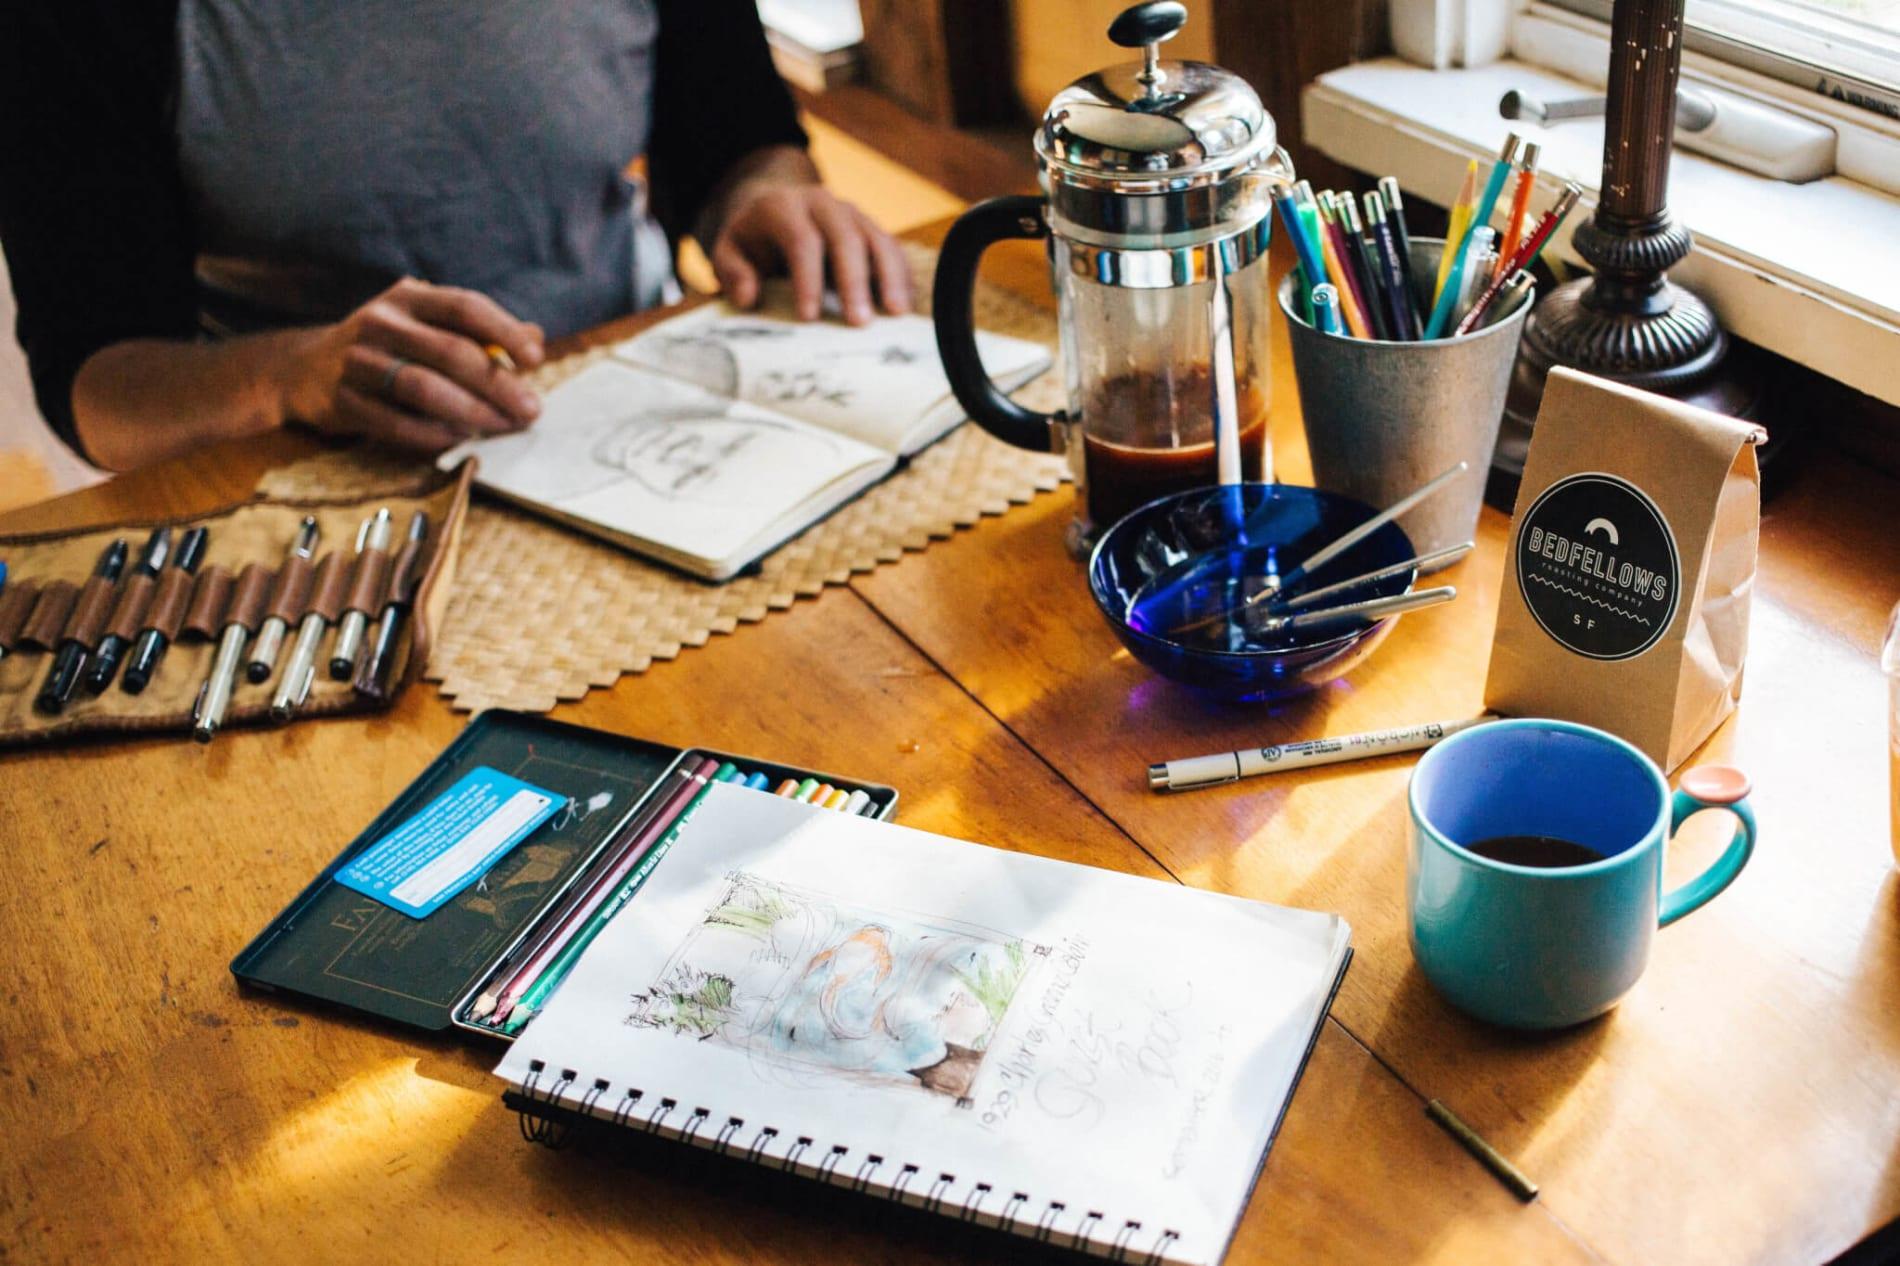 Pump Up Your People's Productivity with This New Take on Workplace Creativity - rachael-gorjestani-X6CZGpJBi8U-unsplash.jpg